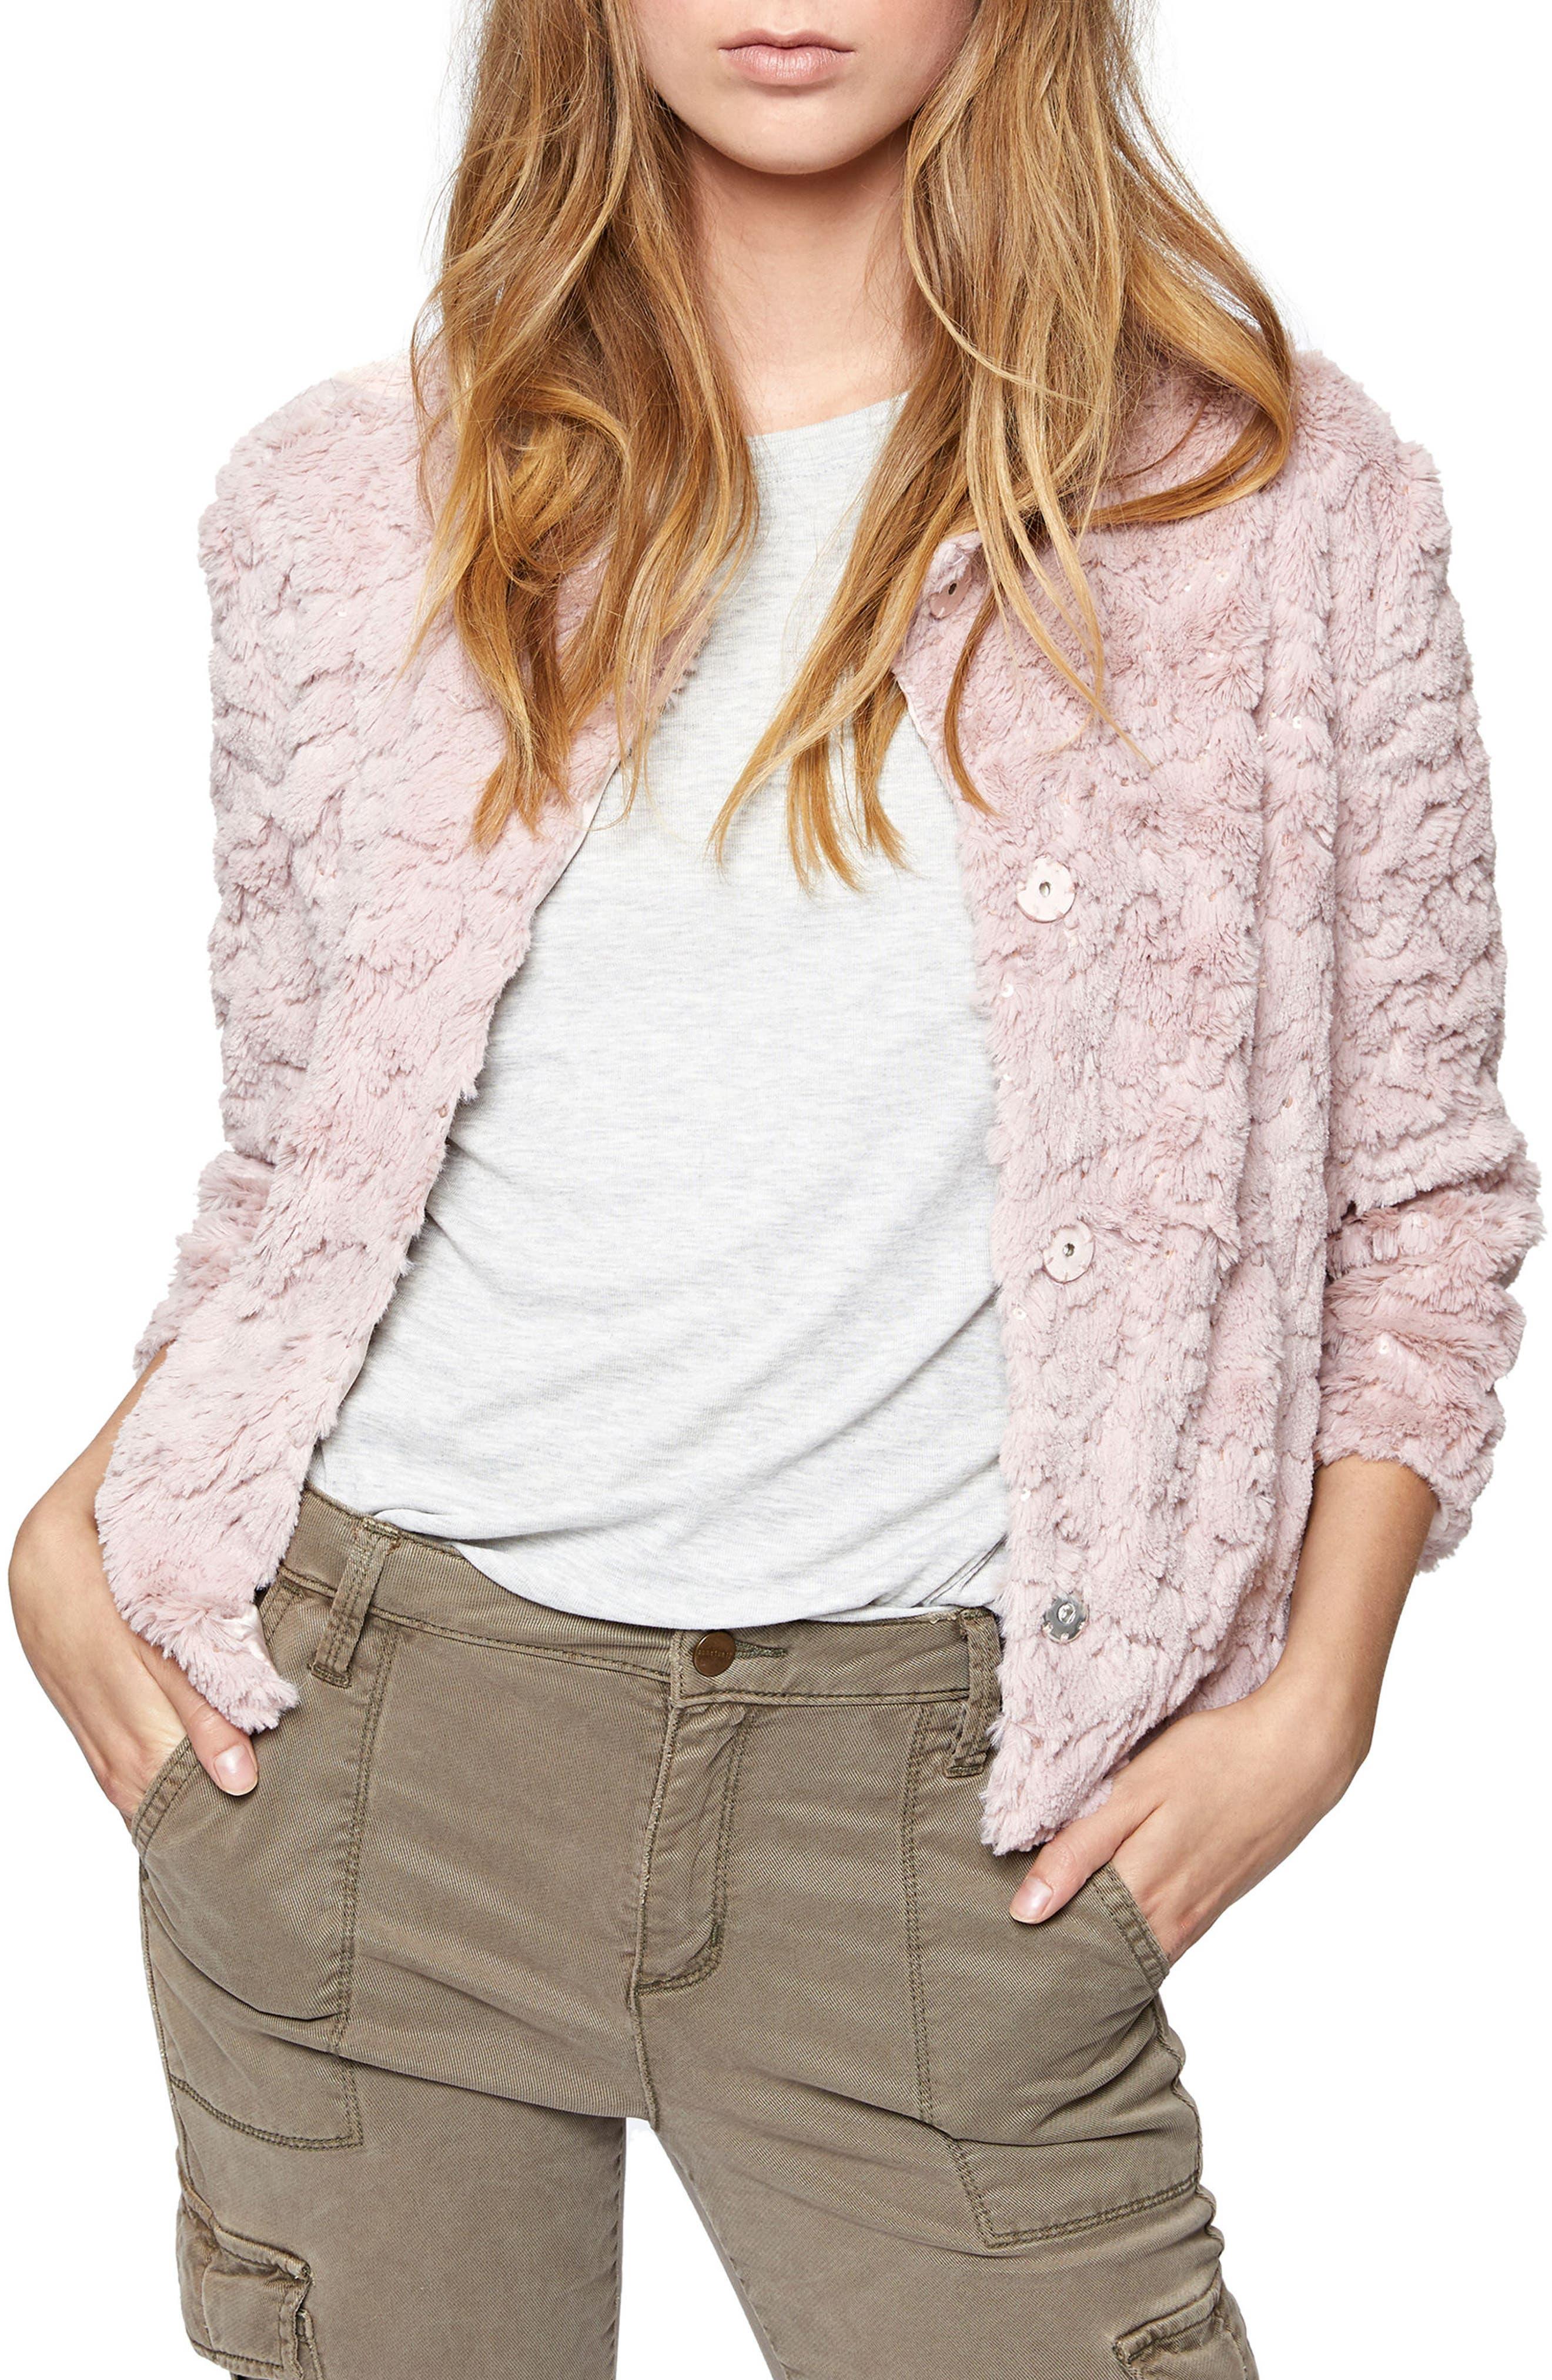 Main Image - Sanctuary Pile Fleece Jacket